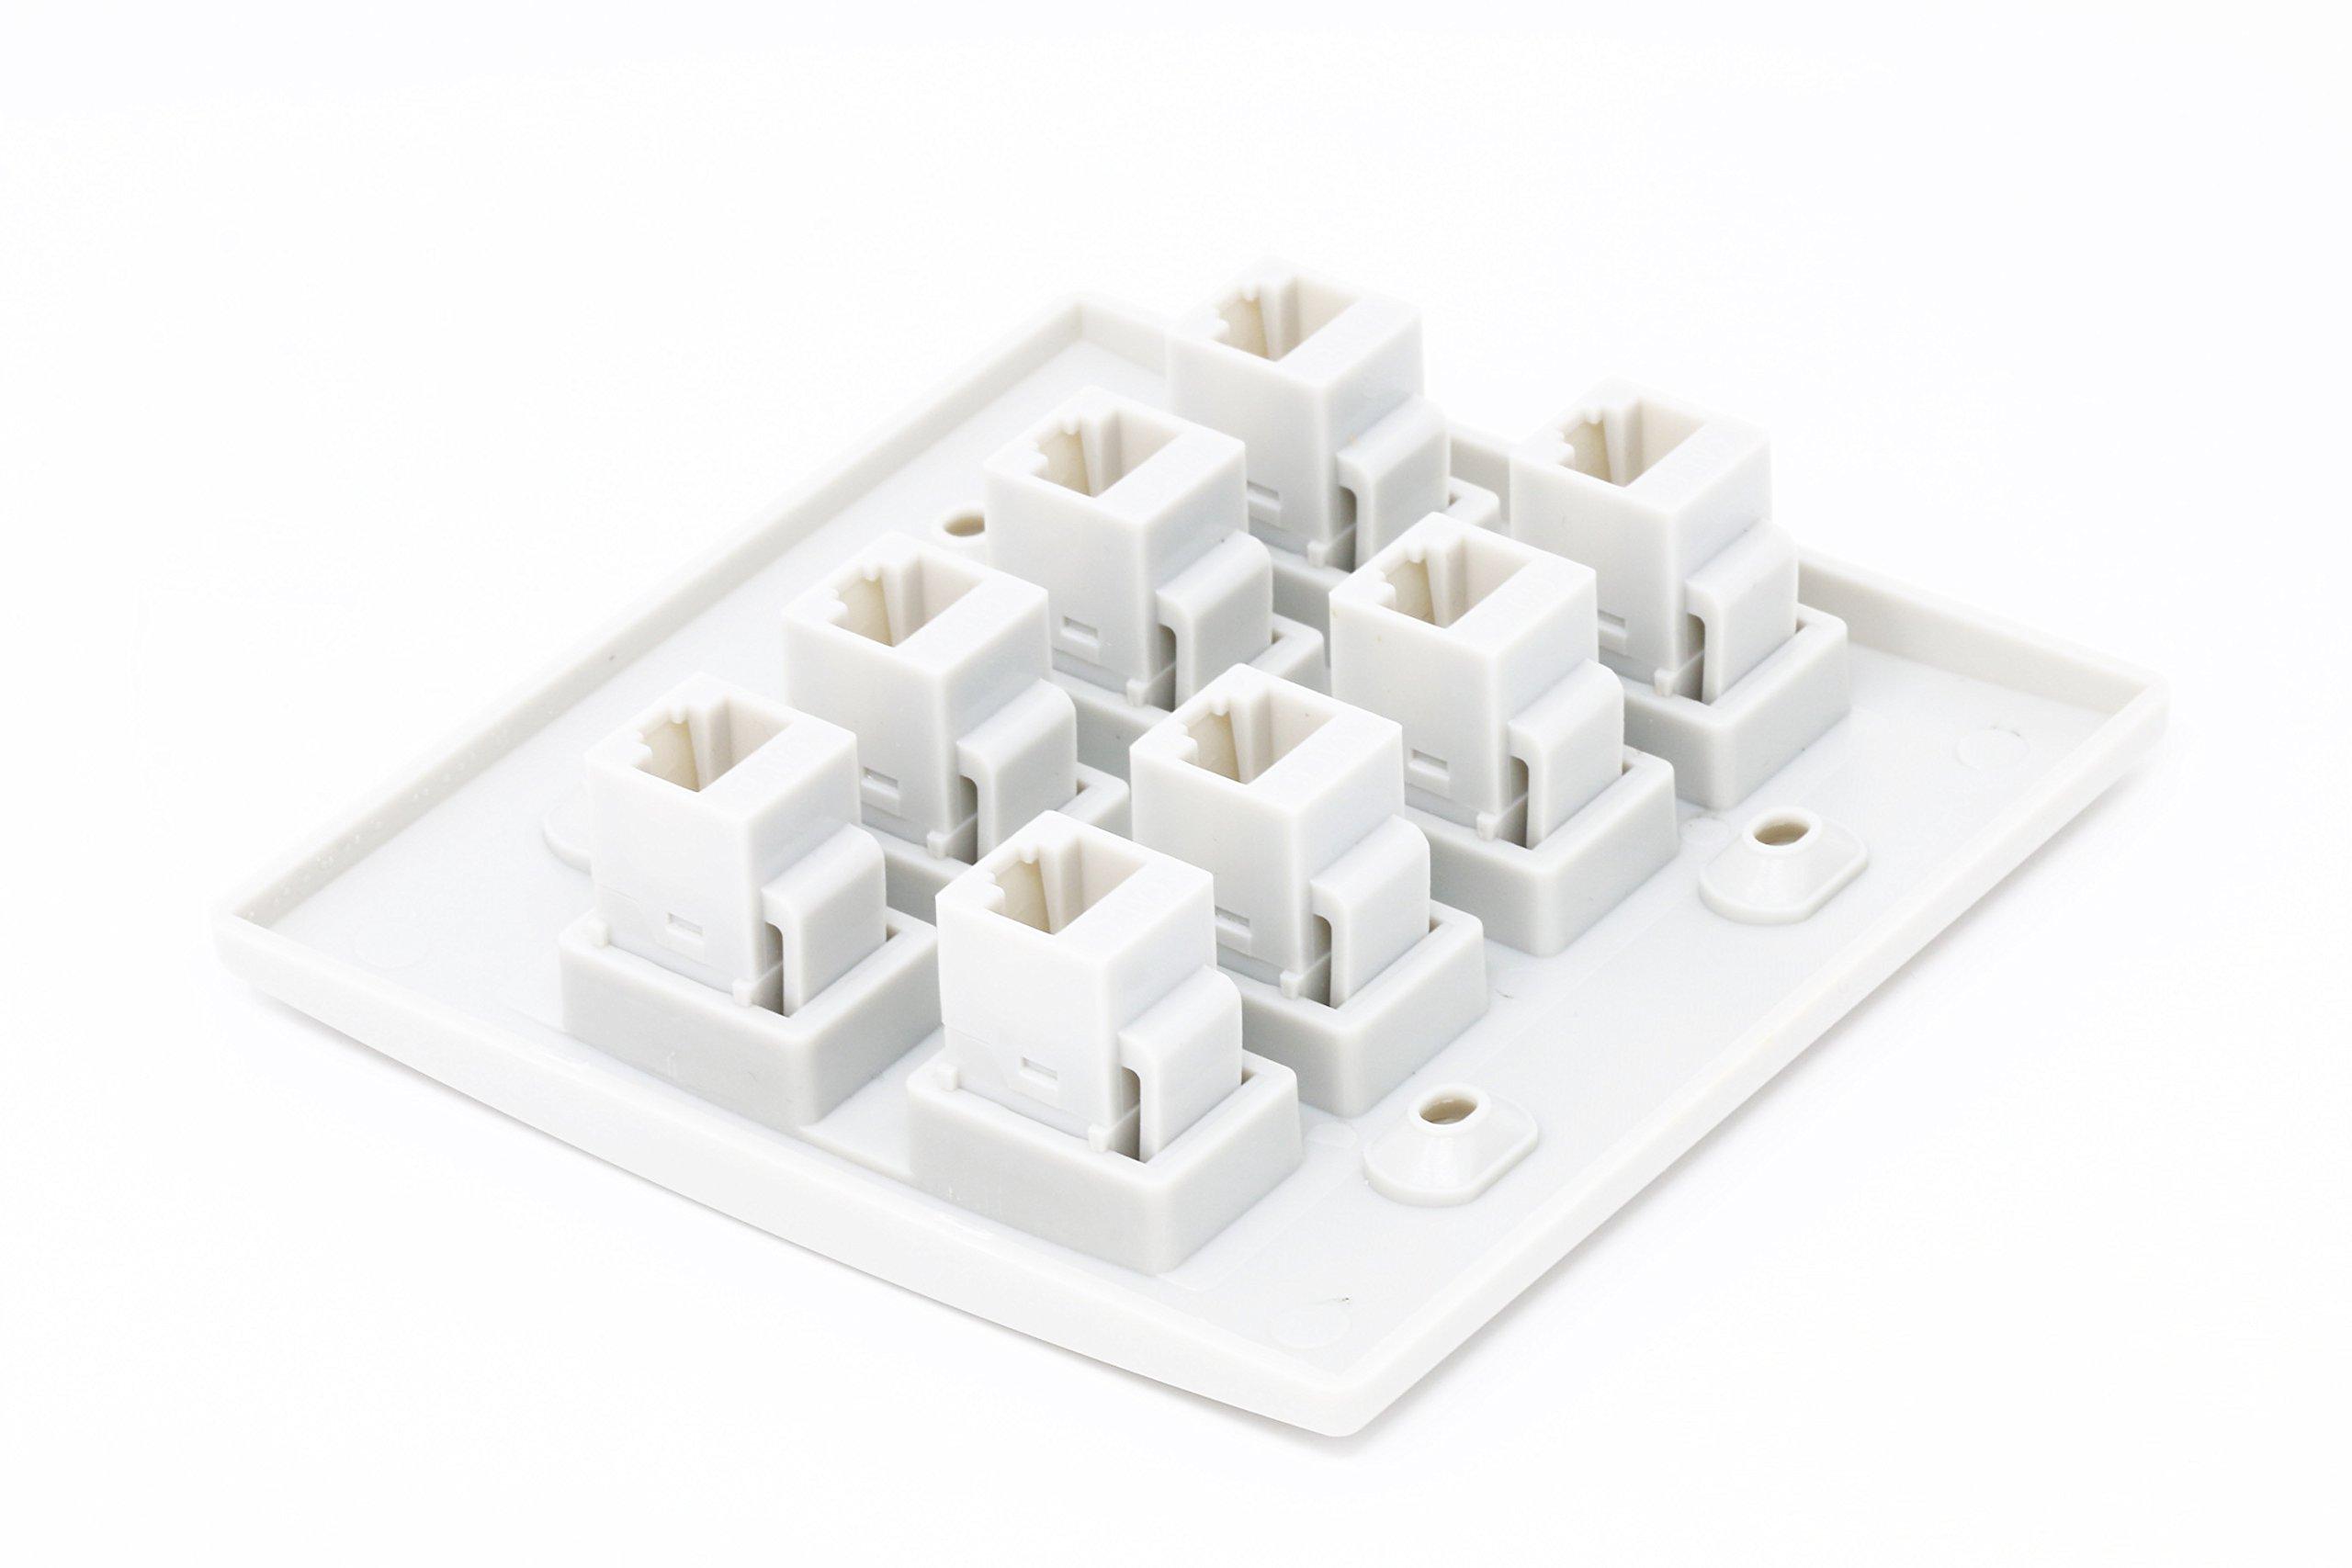 RiteAV 8 Port Flat Dual 2 Gang Ethernet Cat6 RJ45 Network Wall Plate - White